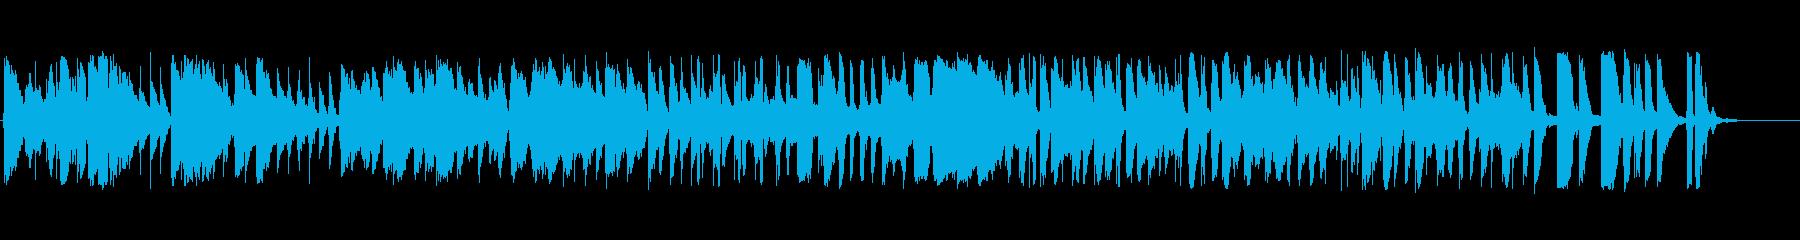 CURTAIN CALL:PEPP...の再生済みの波形